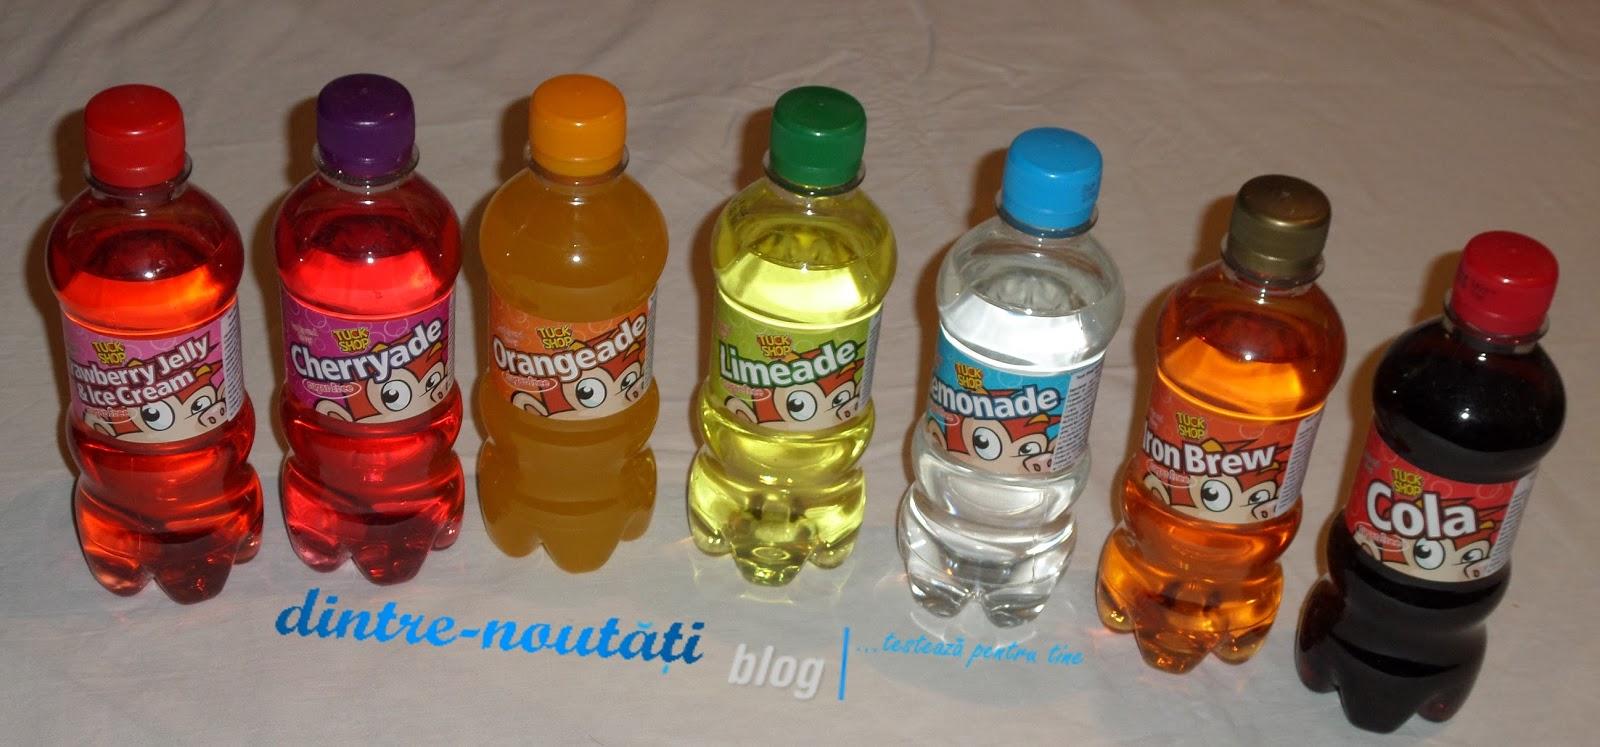 COLA, IronBrew, Lemonade, Limeade, ORANGEADE, Cherryade, Strawberry Jelly &IceCream